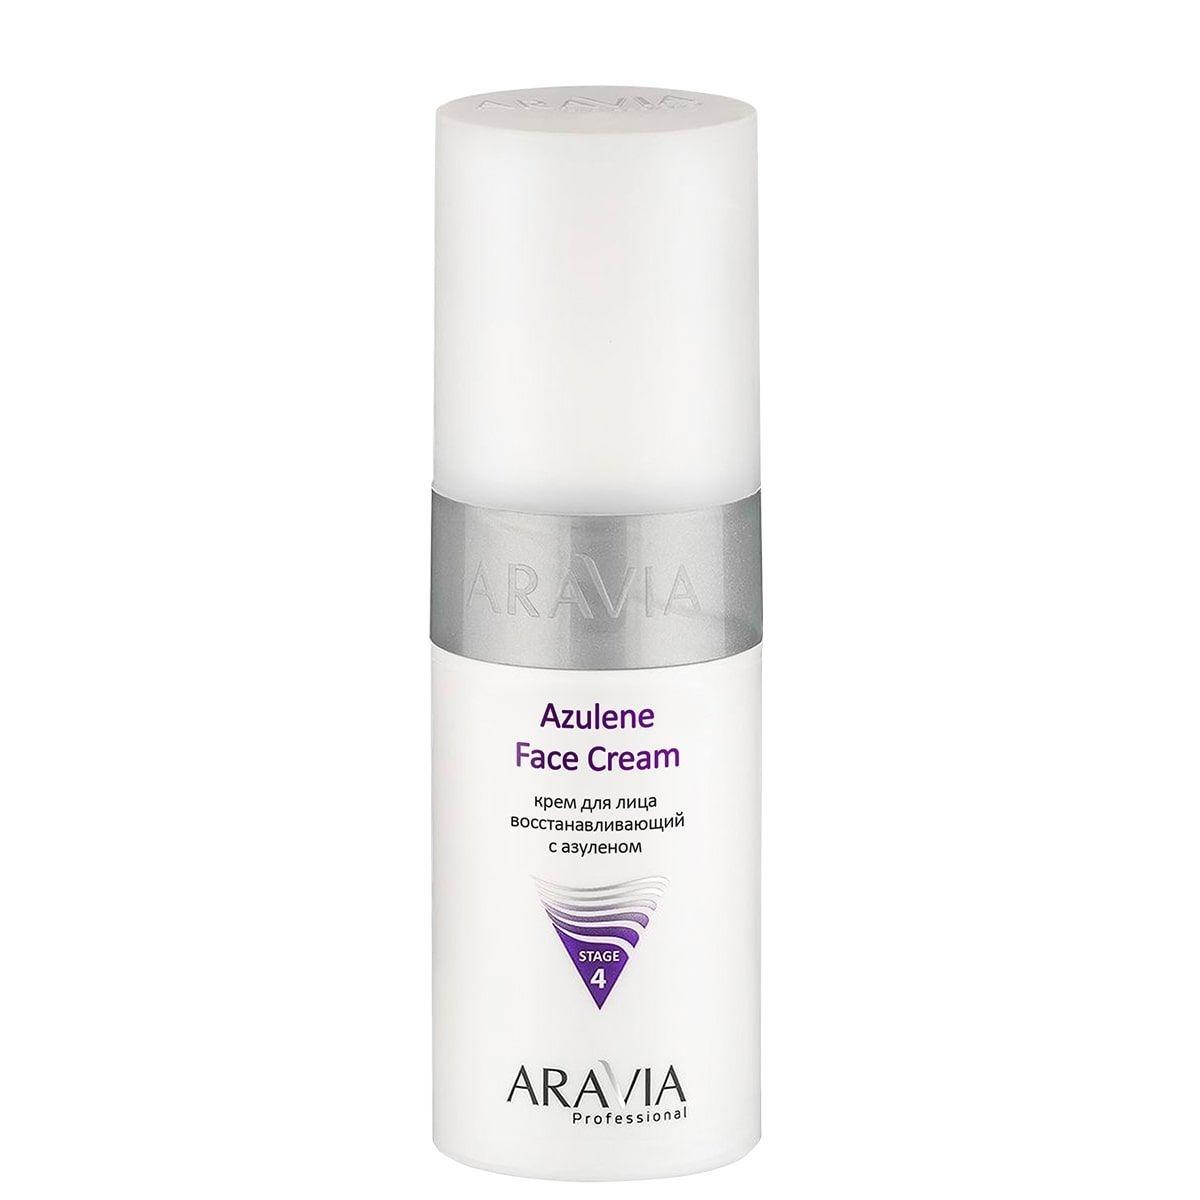 ARAVIA Крем для Лица Восстанавливающий с Азуленом Azulene Face Cream, 150 мл